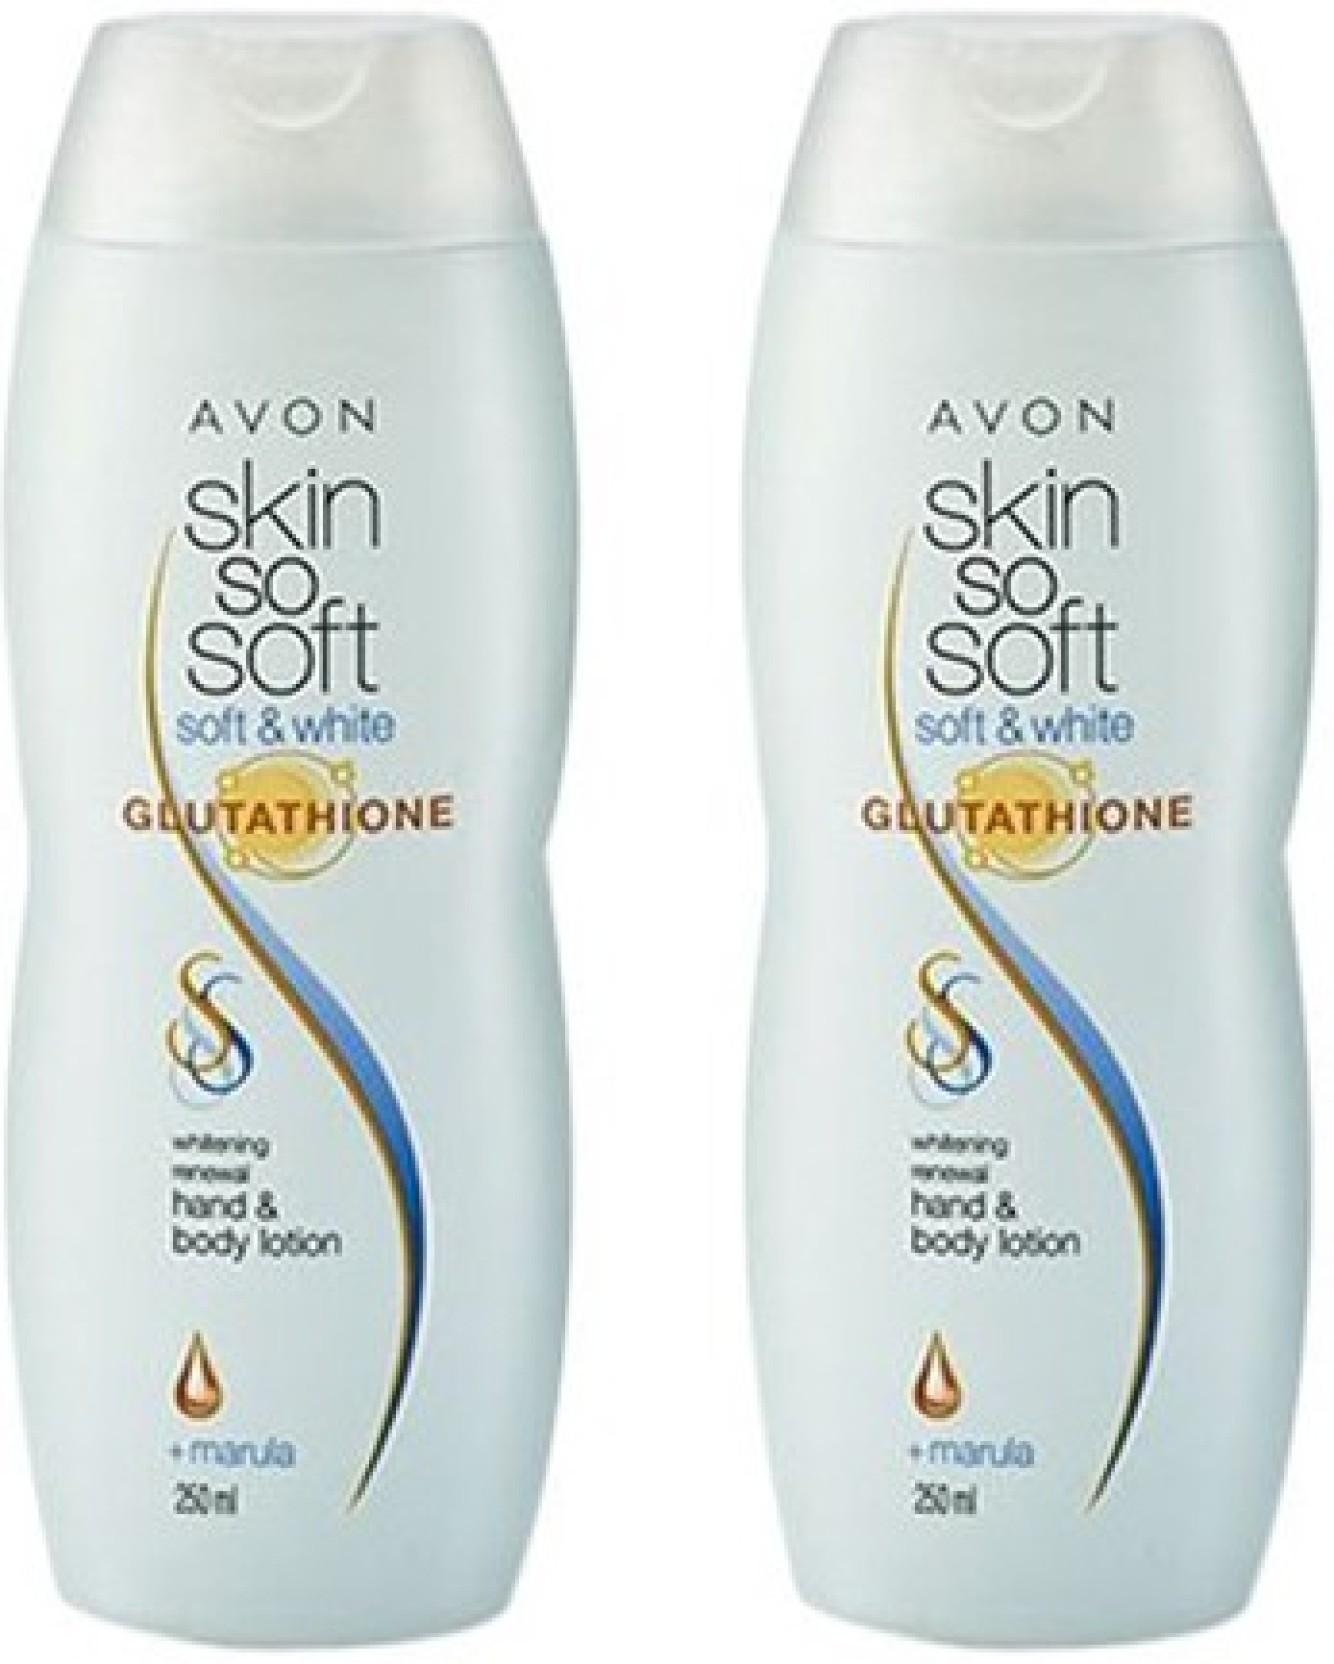 Avon Soft White Protect Enhance Whitening Hand Body Lotion Buy 1 Get Natur E Daily Nourishing 100 Ml I Handbody 250 Each Share